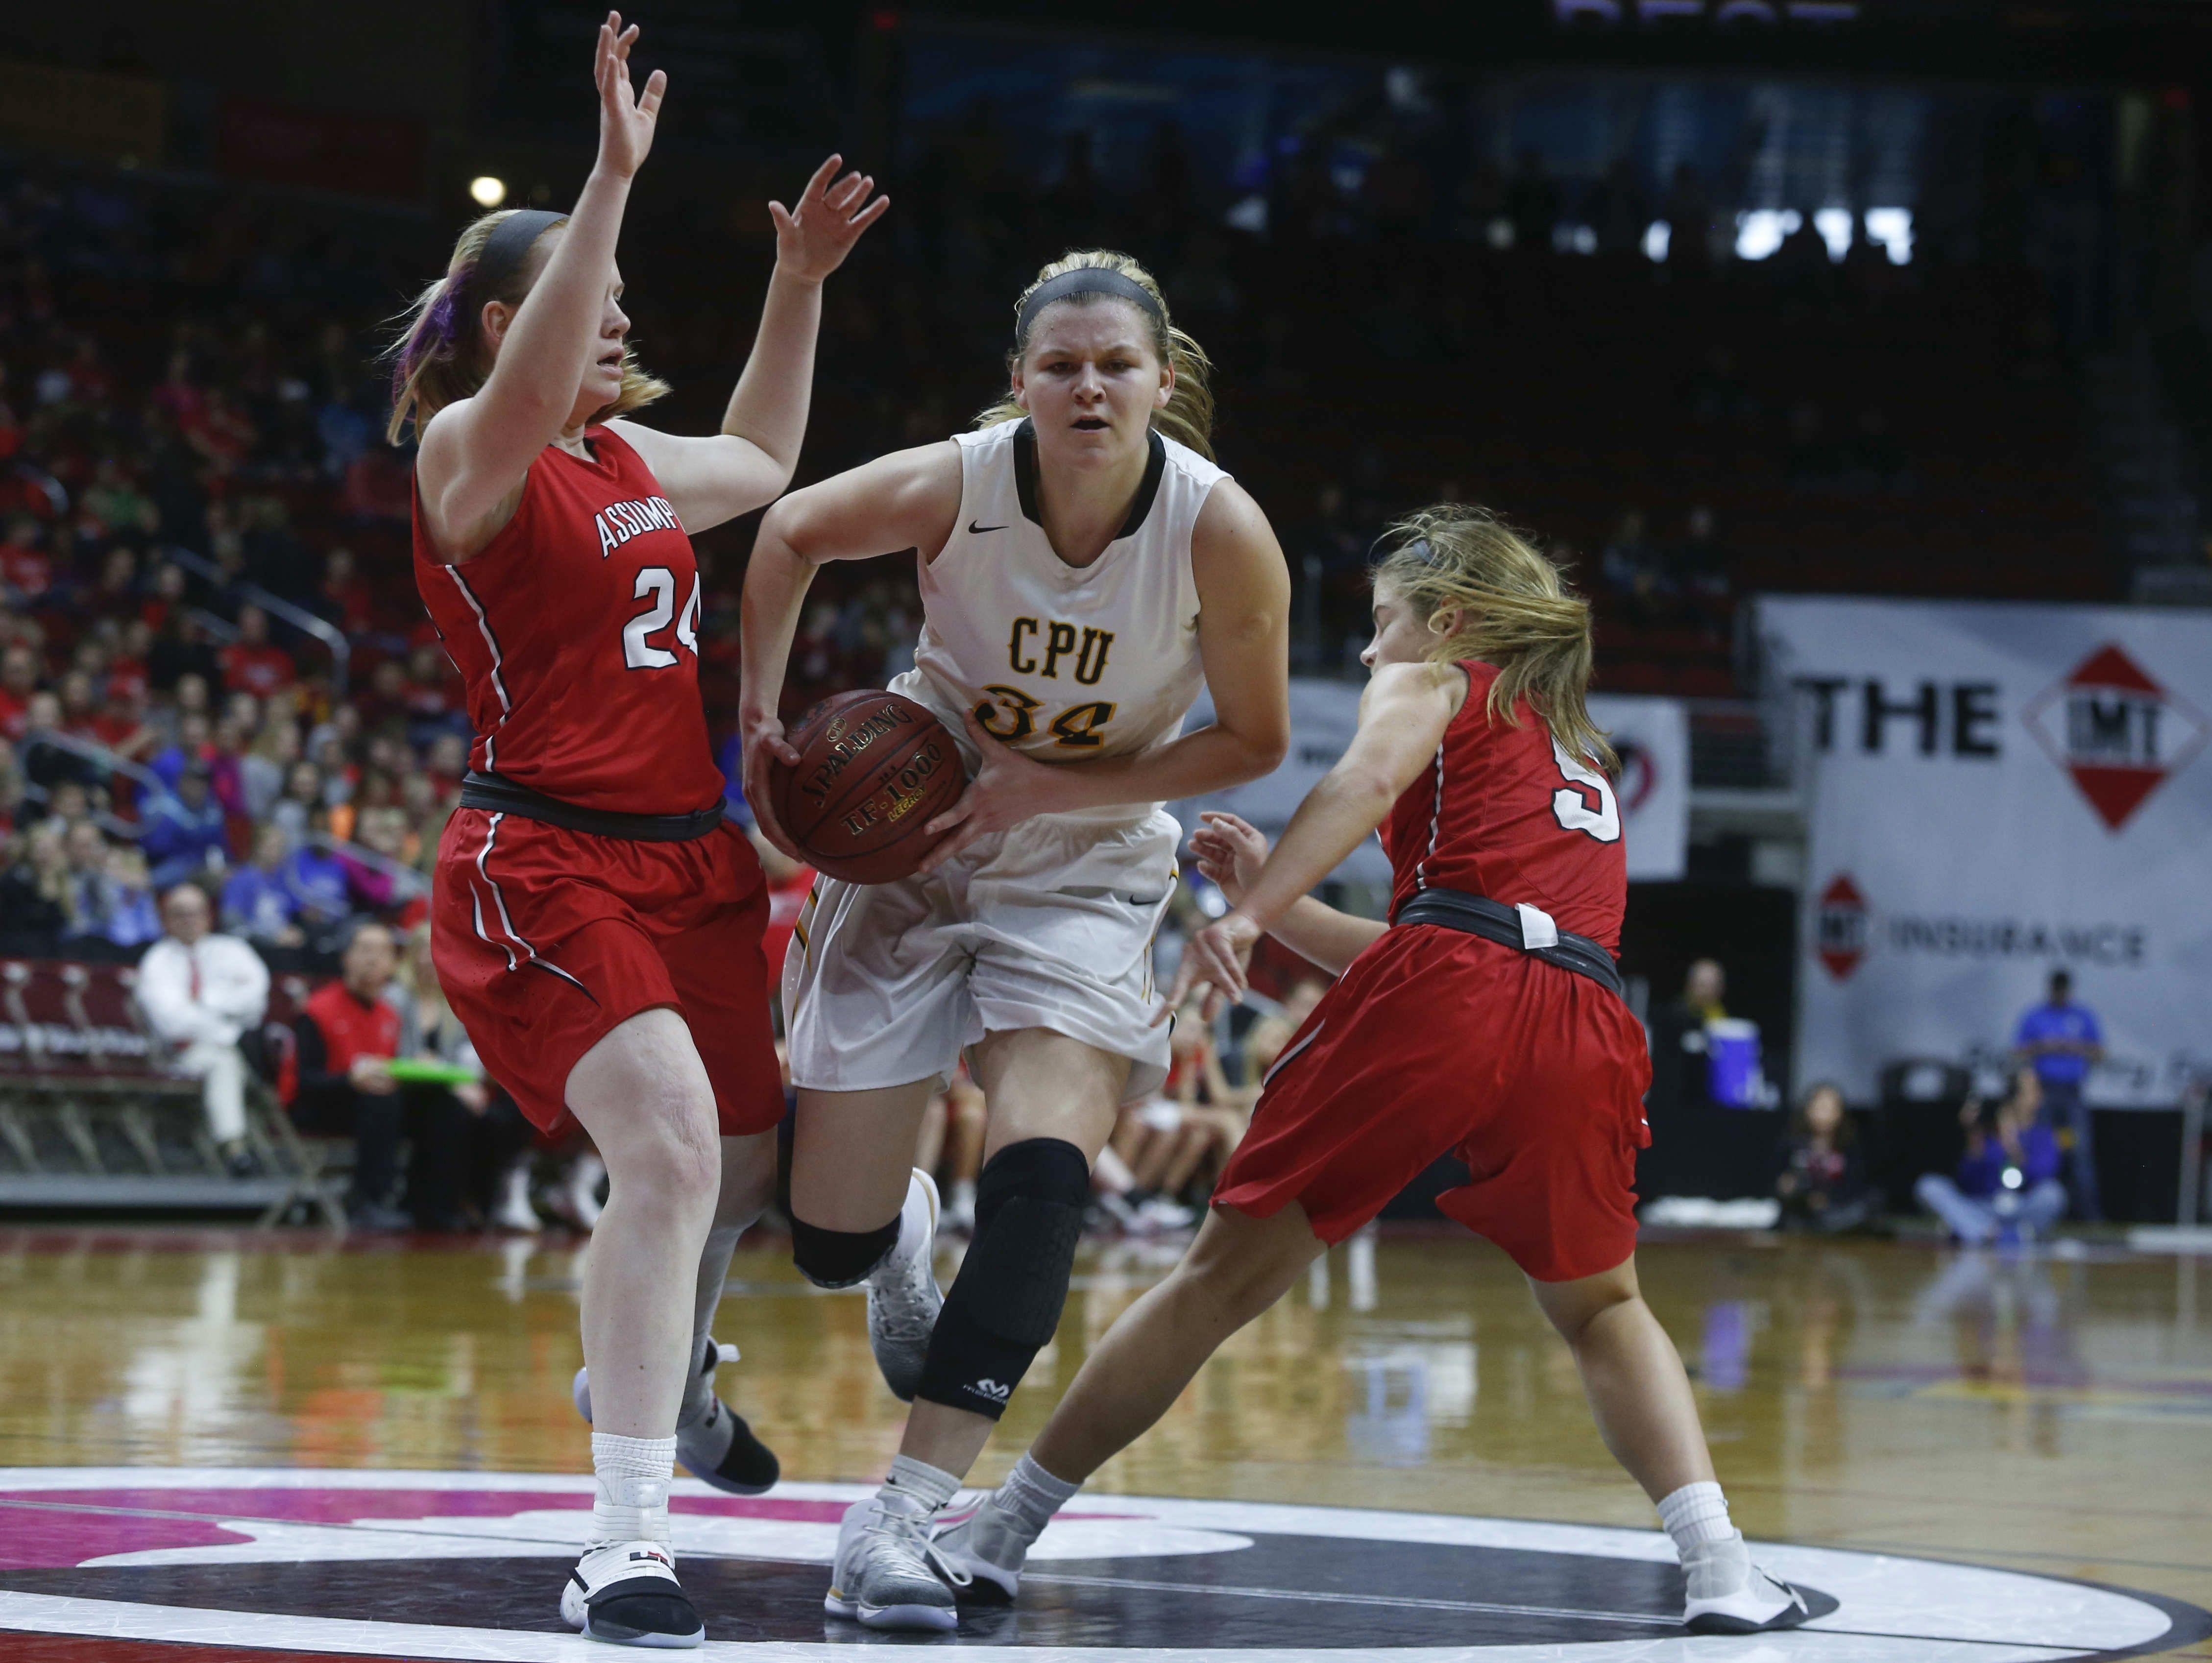 Center Point-Urbana's Allison Wooldridge drives in against Davenport Assumption on Tuesday, Feb. 28, 2017, at Wells Fargo Arena in Des Moines.